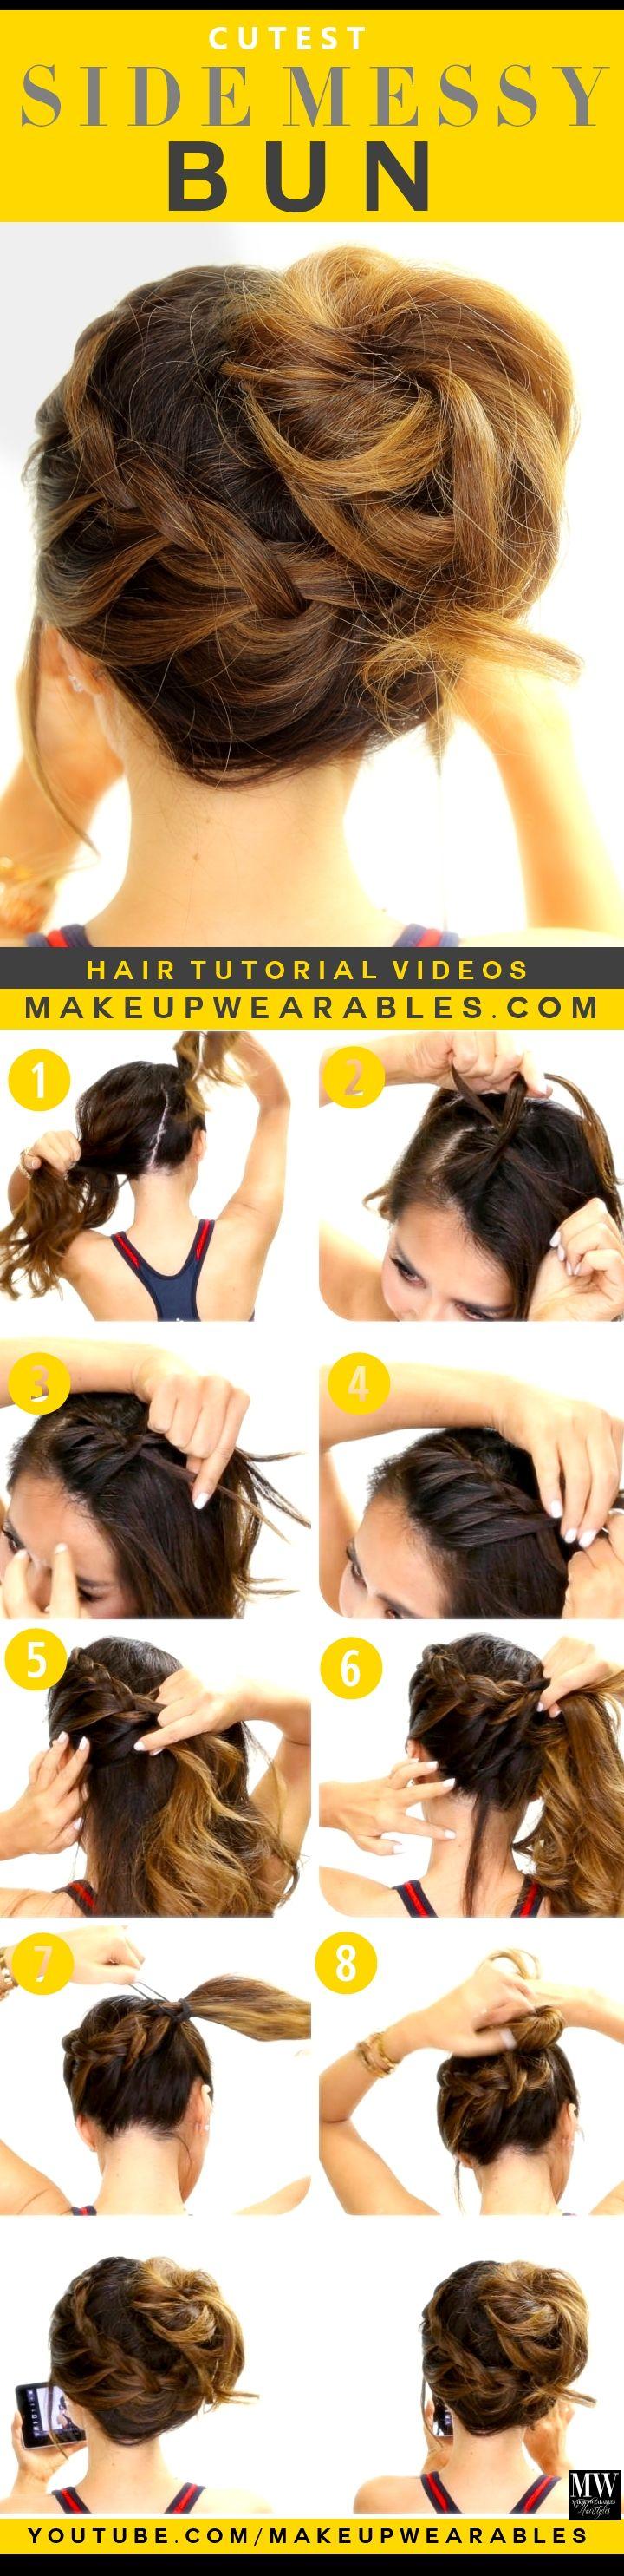 Cute side messy bun braid updo hairstyles ファッションアイデア